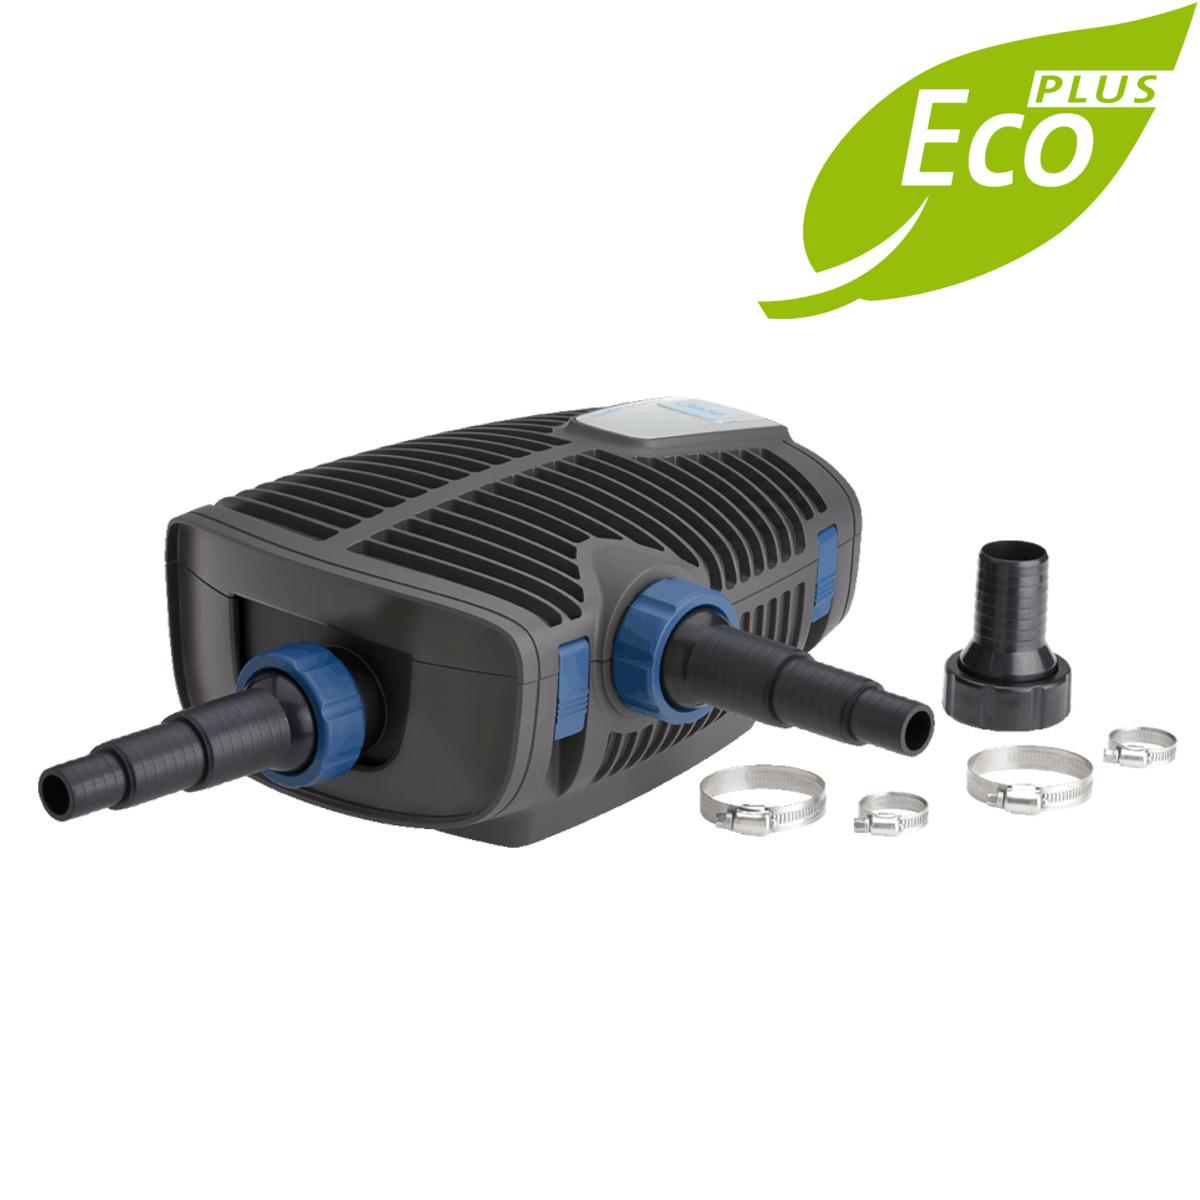 Teichfilterpumpe Bachlaufpumpe Oase Aquamax Eco Premium 4000 Oase Aquamax